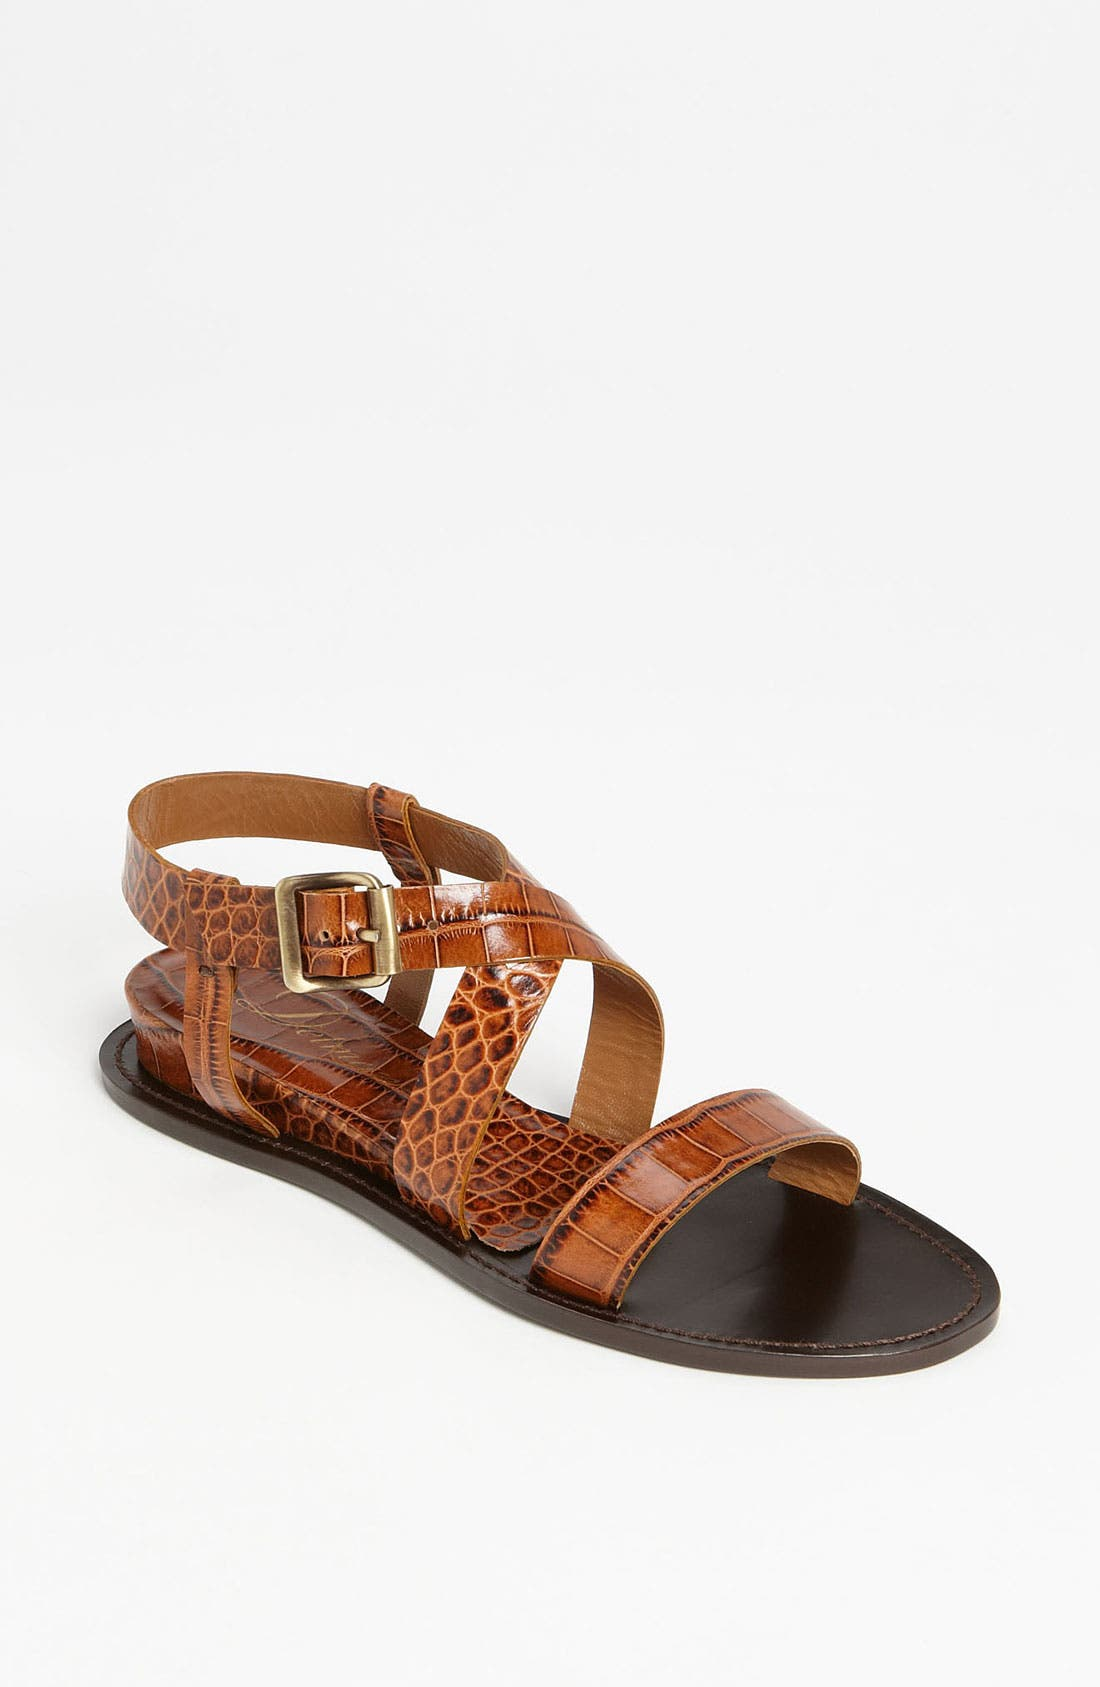 Alternate Image 1 Selected - Delman 'Maude' Sandal